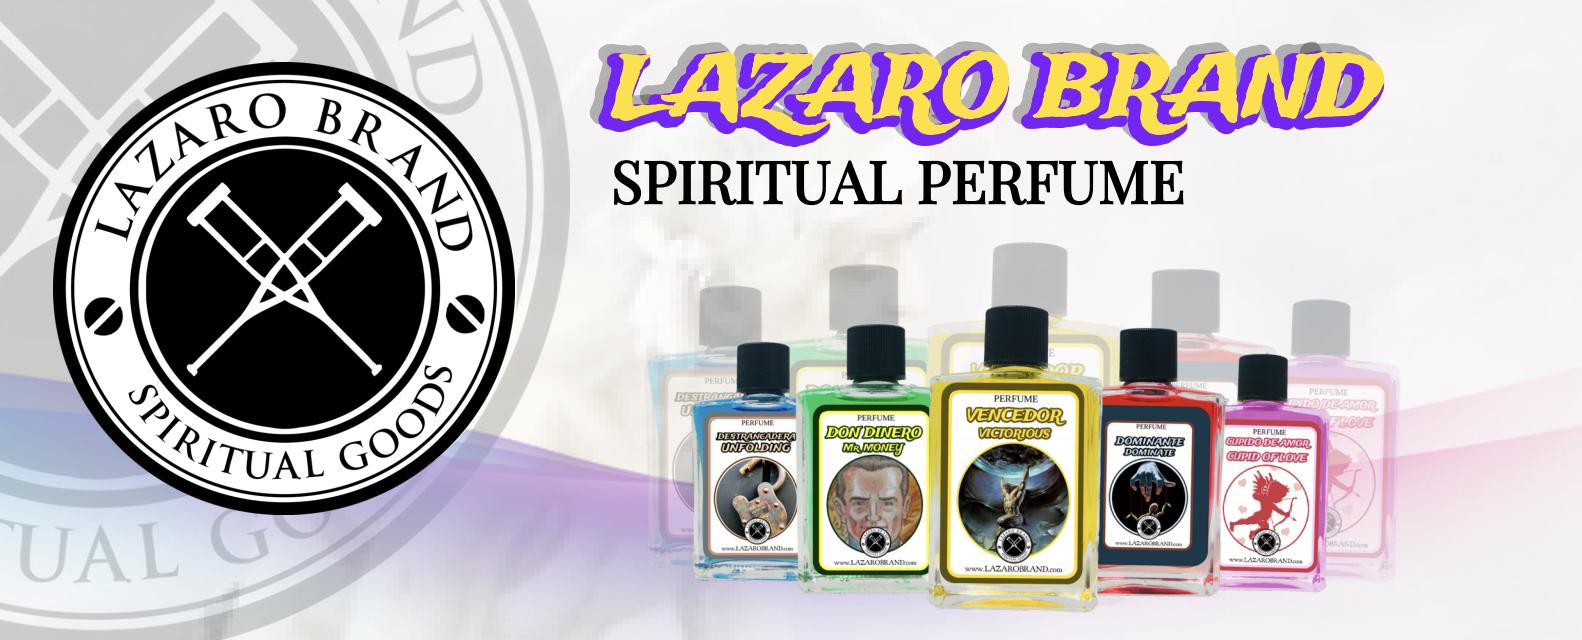 perfumeheader-copy.png